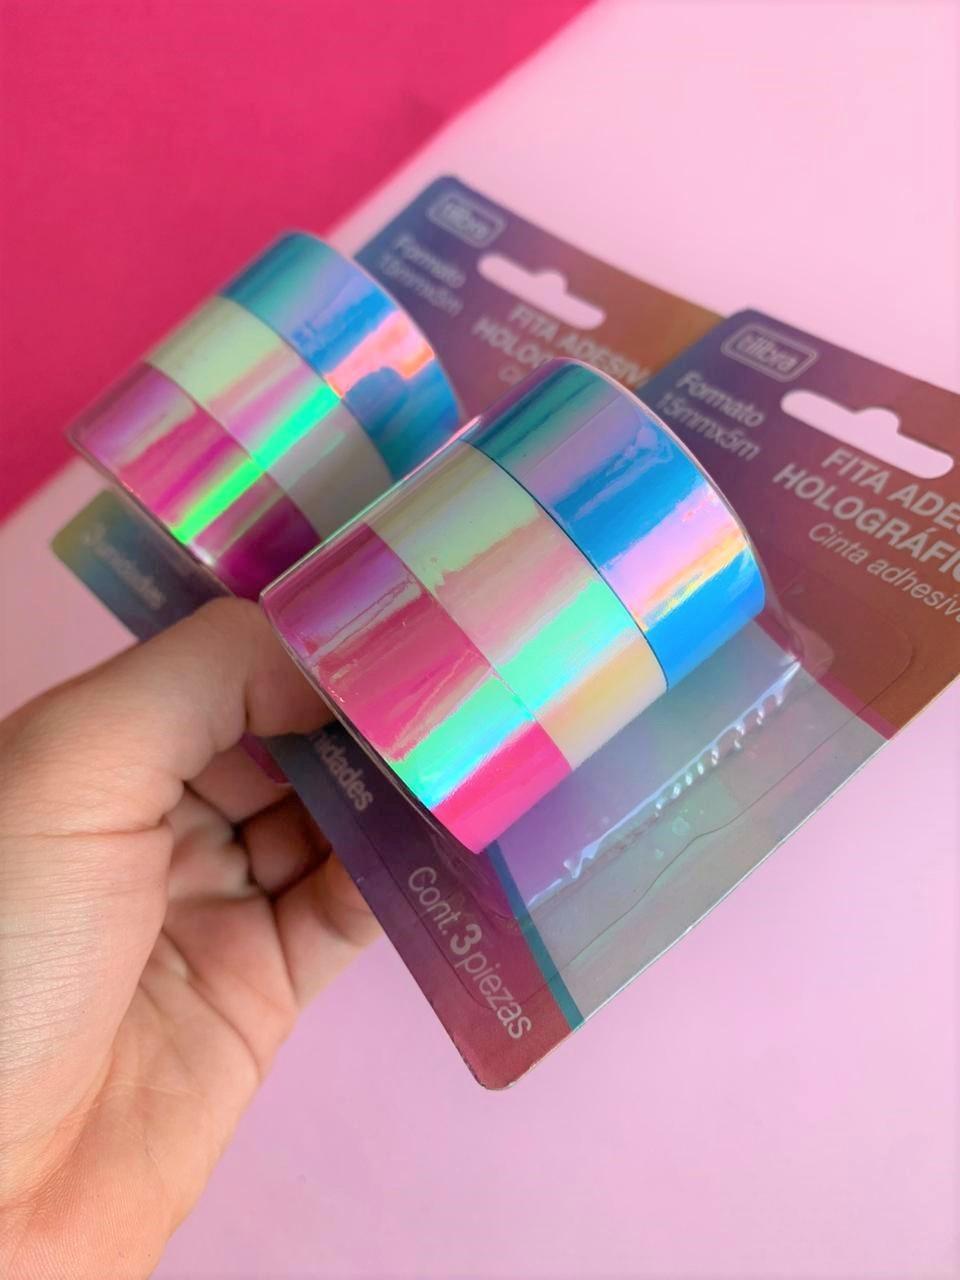 Fita Adesiva Washi Tape Holográfica 15mmX5m - Blister com 3 unidades | Tilibra